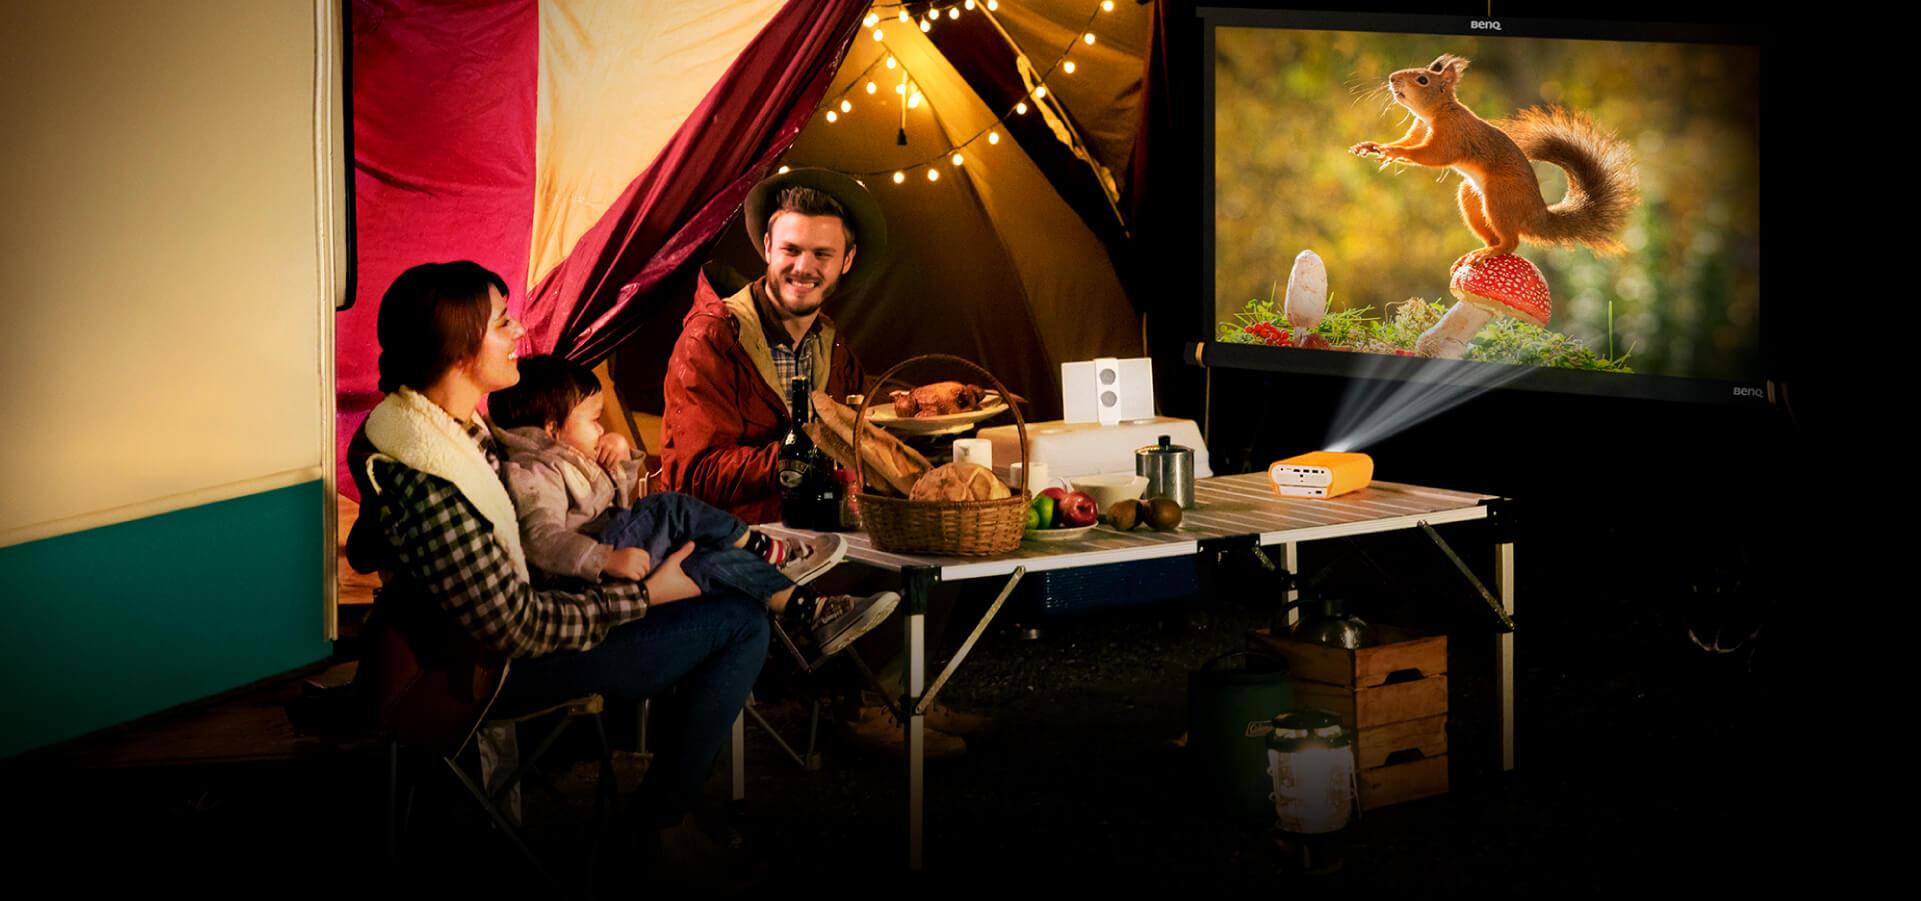 outdoor-camping-gs1.jpg